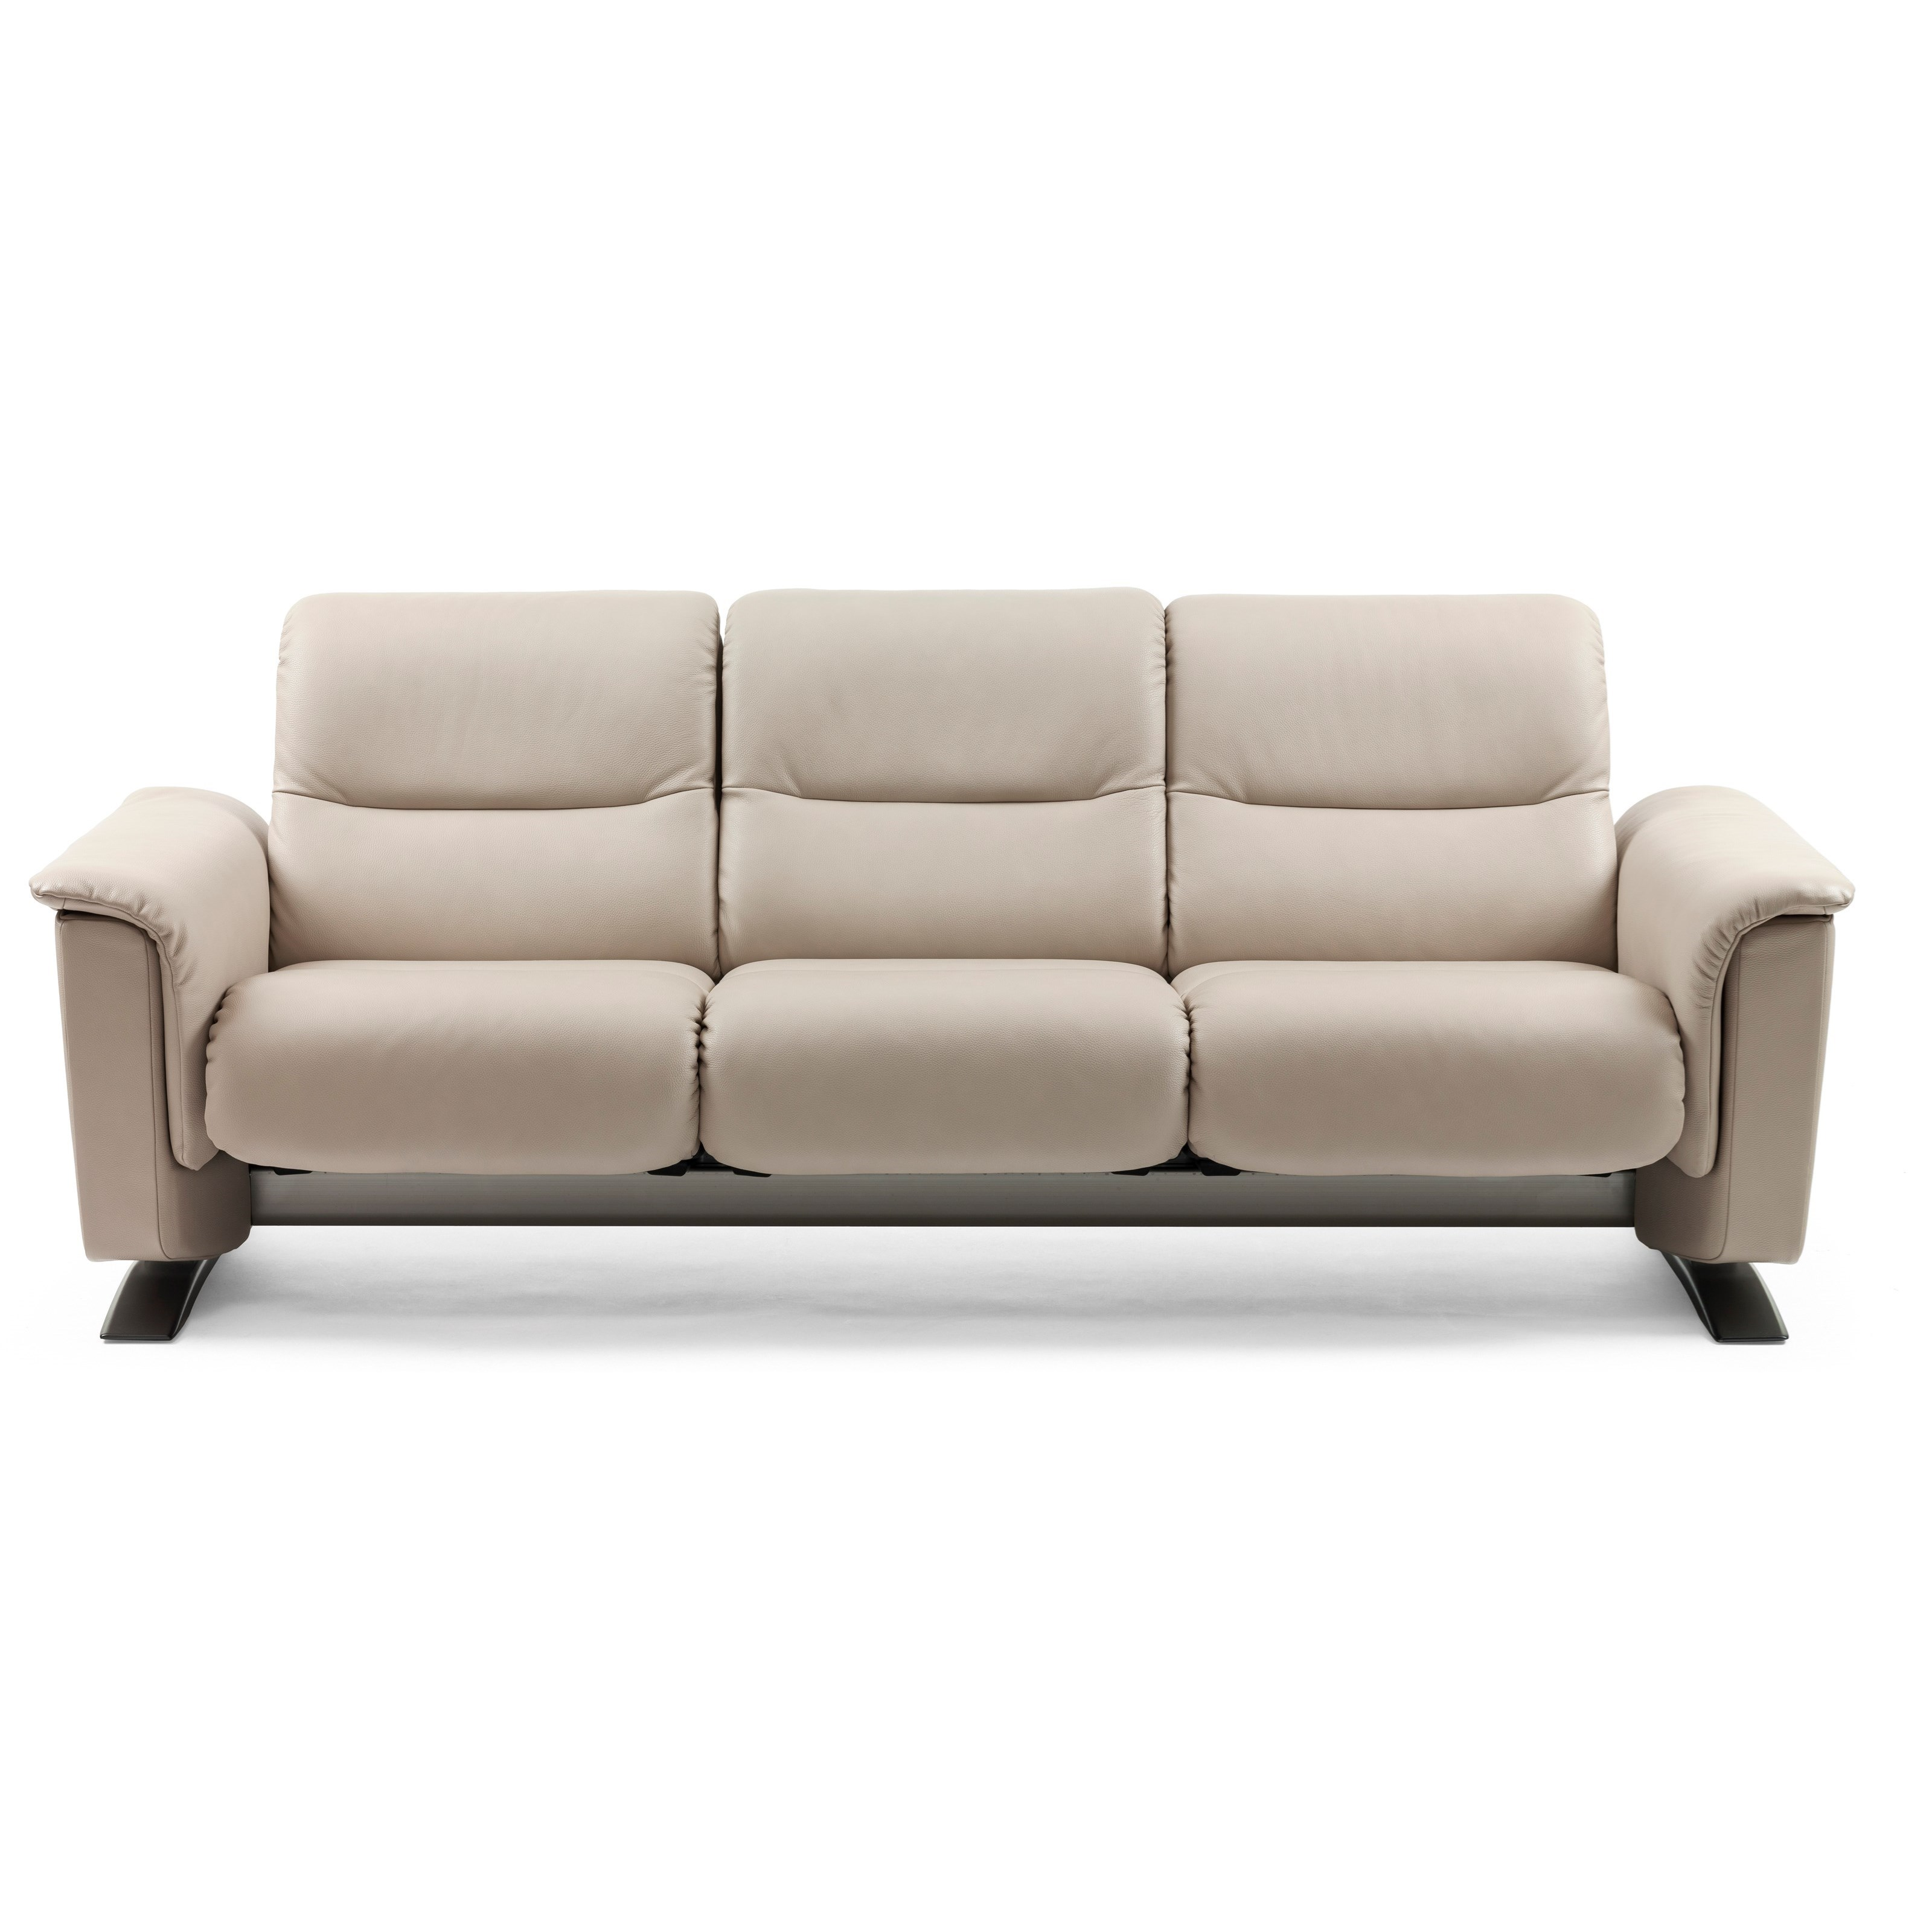 Stressless By Ekornes Stressless Panorama 1402030 3 Seater Sofa With Balanceadapt System John